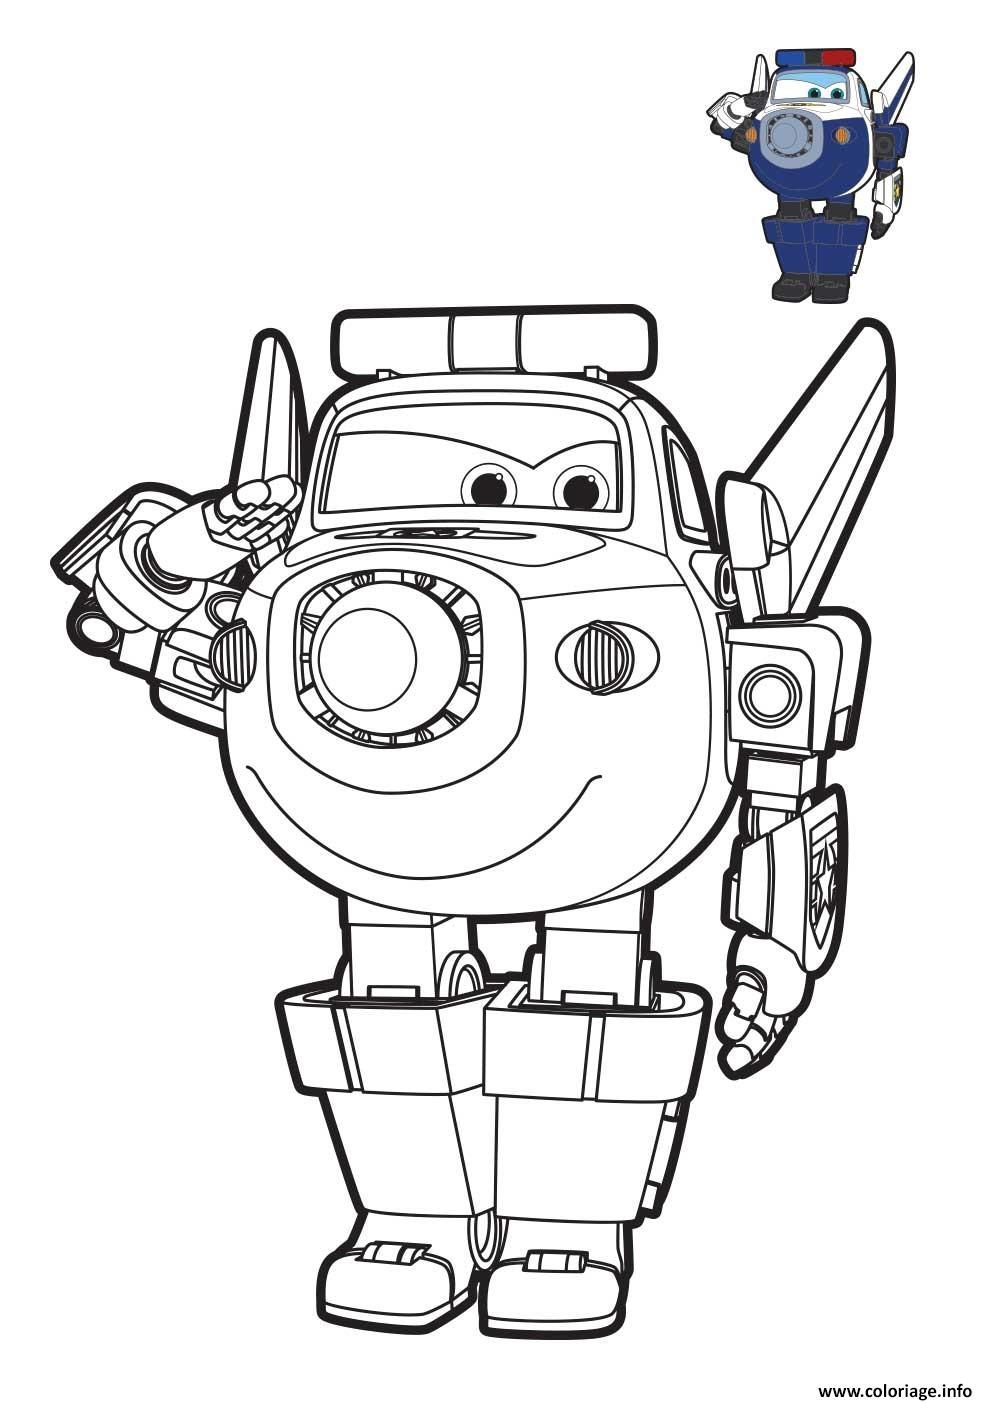 Coloriage super wings paul robot dessin - Robot coloriage ...